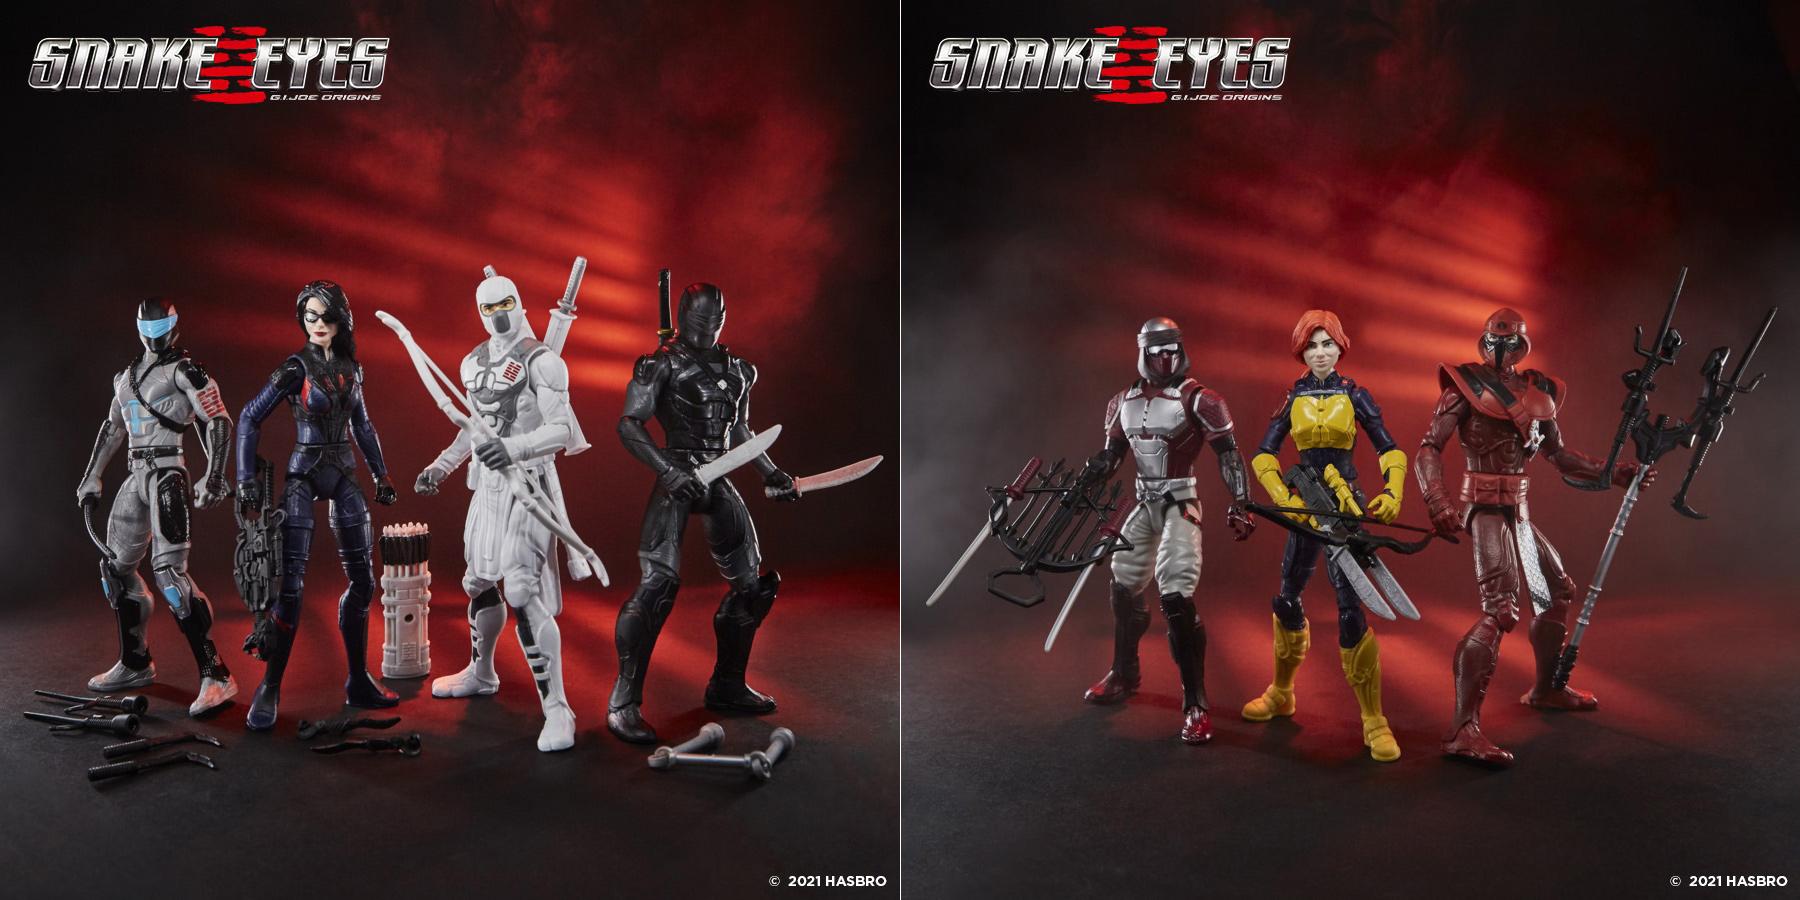 snake-eyes-gi-joe-origins-movie-core-action-figures